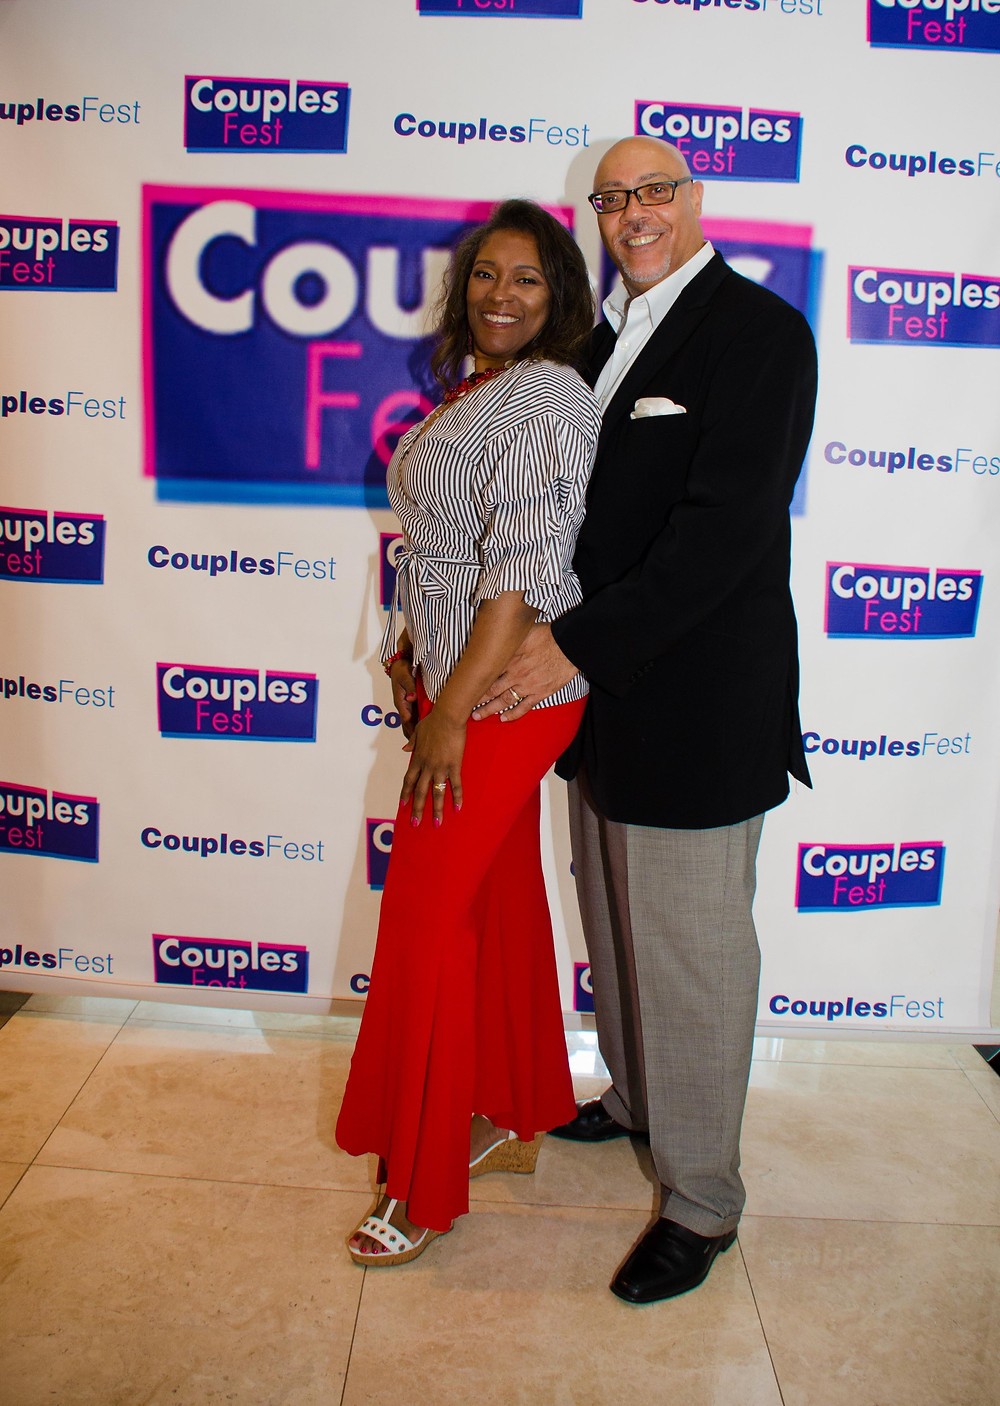 James and Cynthia Greene